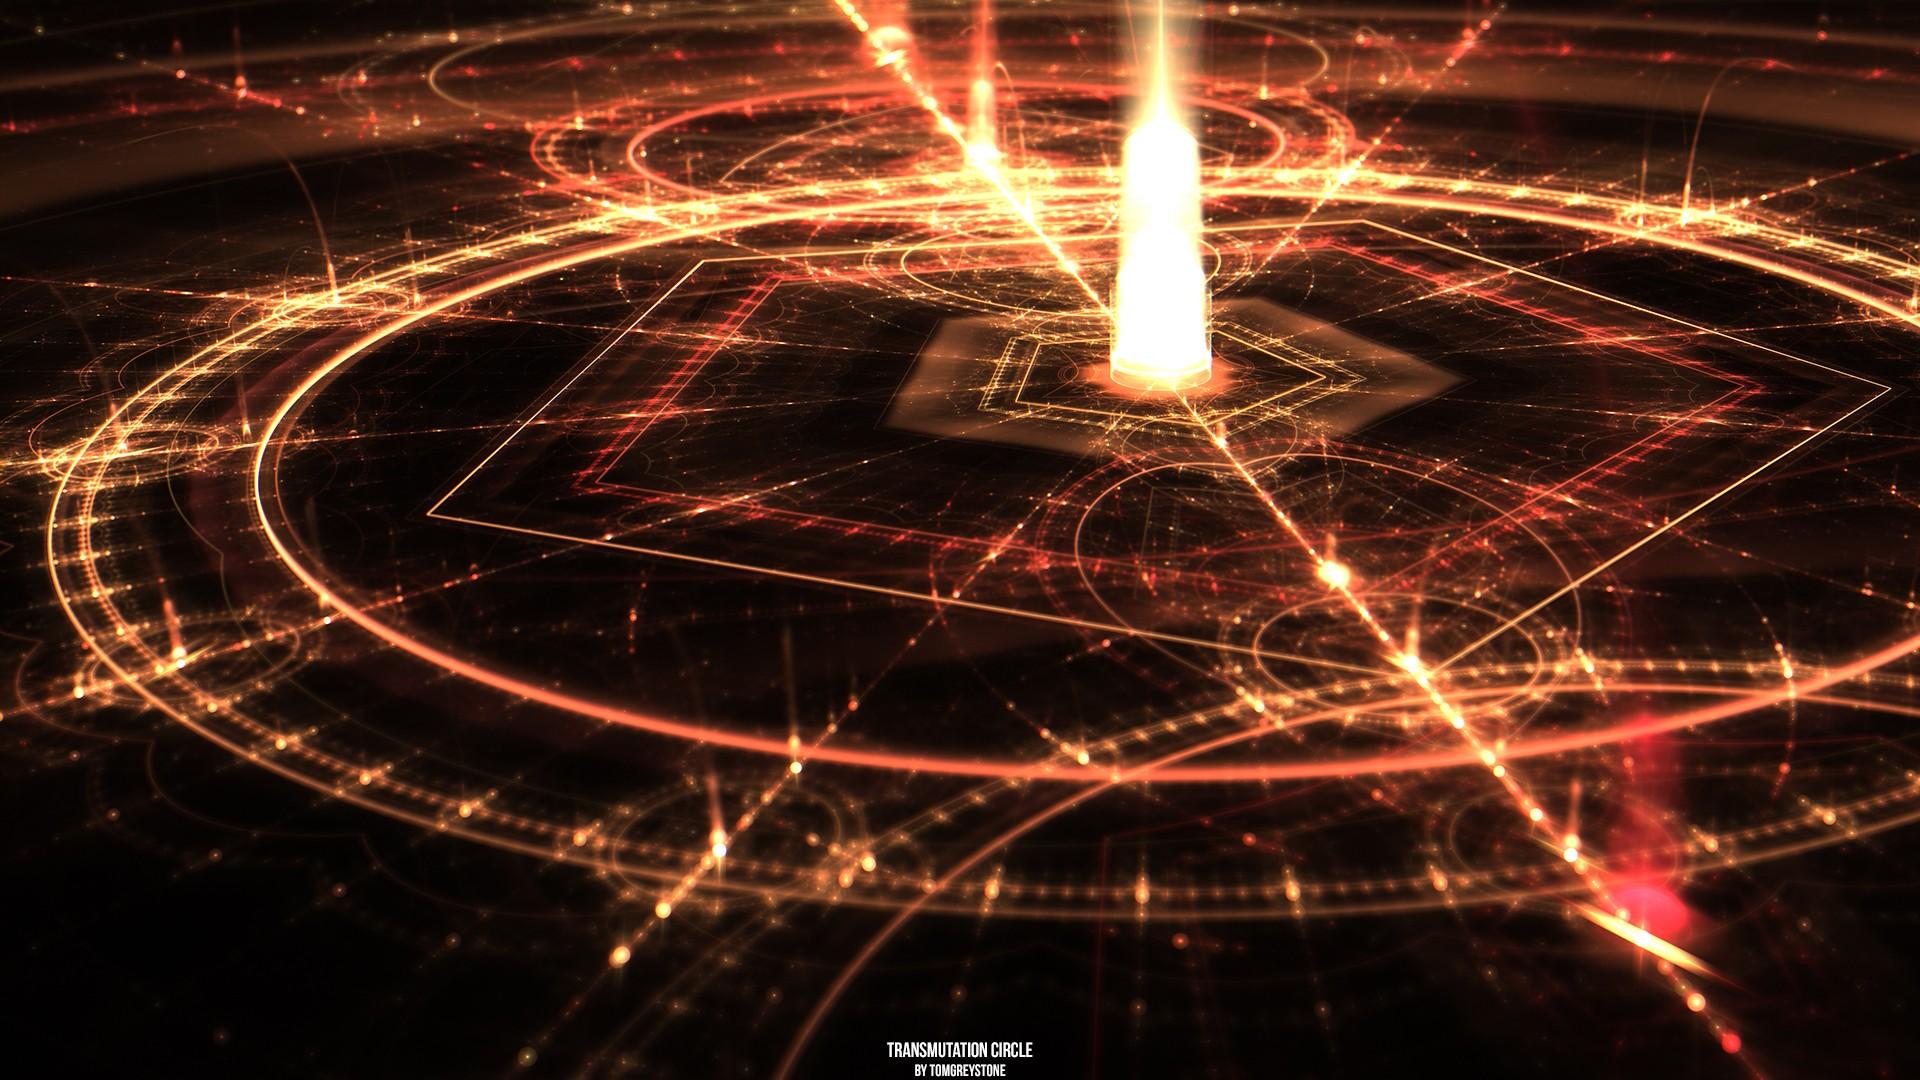 General 1920x1080 abstract circle geometry lights Full Metal Alchemist Transmutation Circle